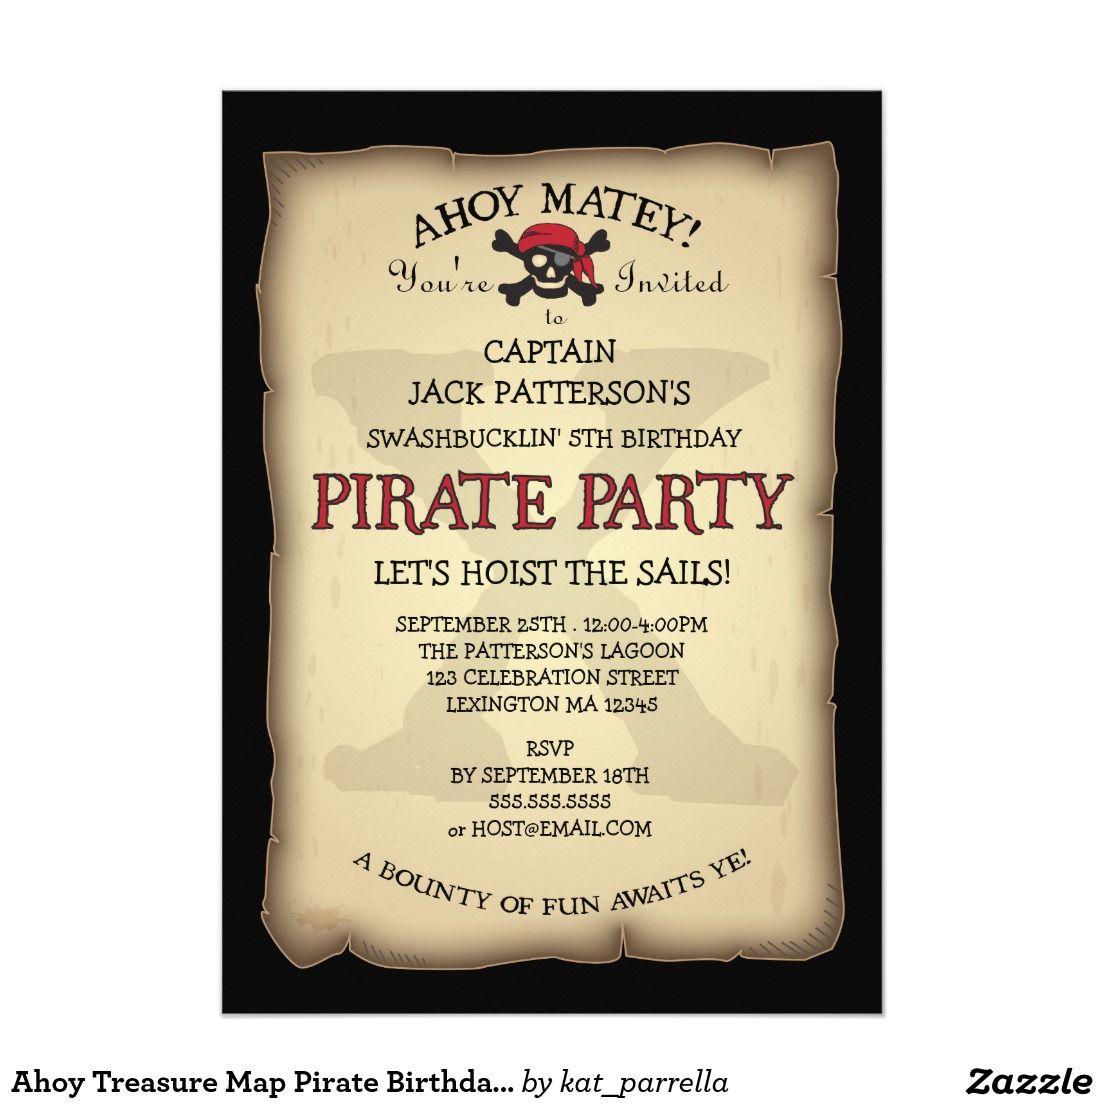 Ahoy Treasure Map Pirate Birthday Party Invitation 5\